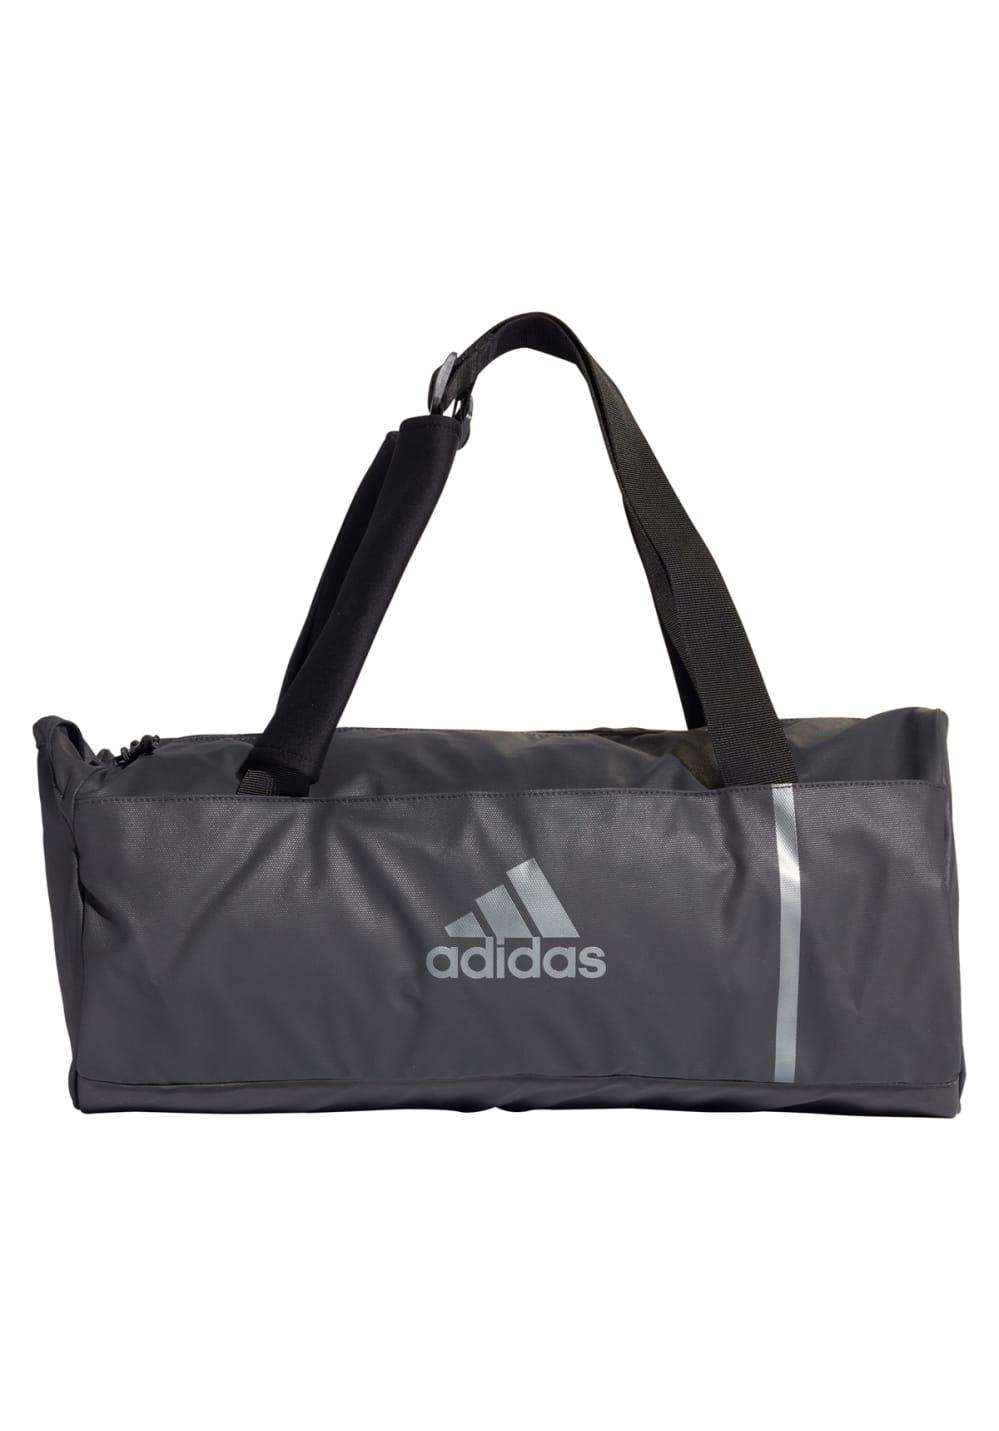 adidas Convertible Training Duffelbag S Sporttaschen - Schwarz